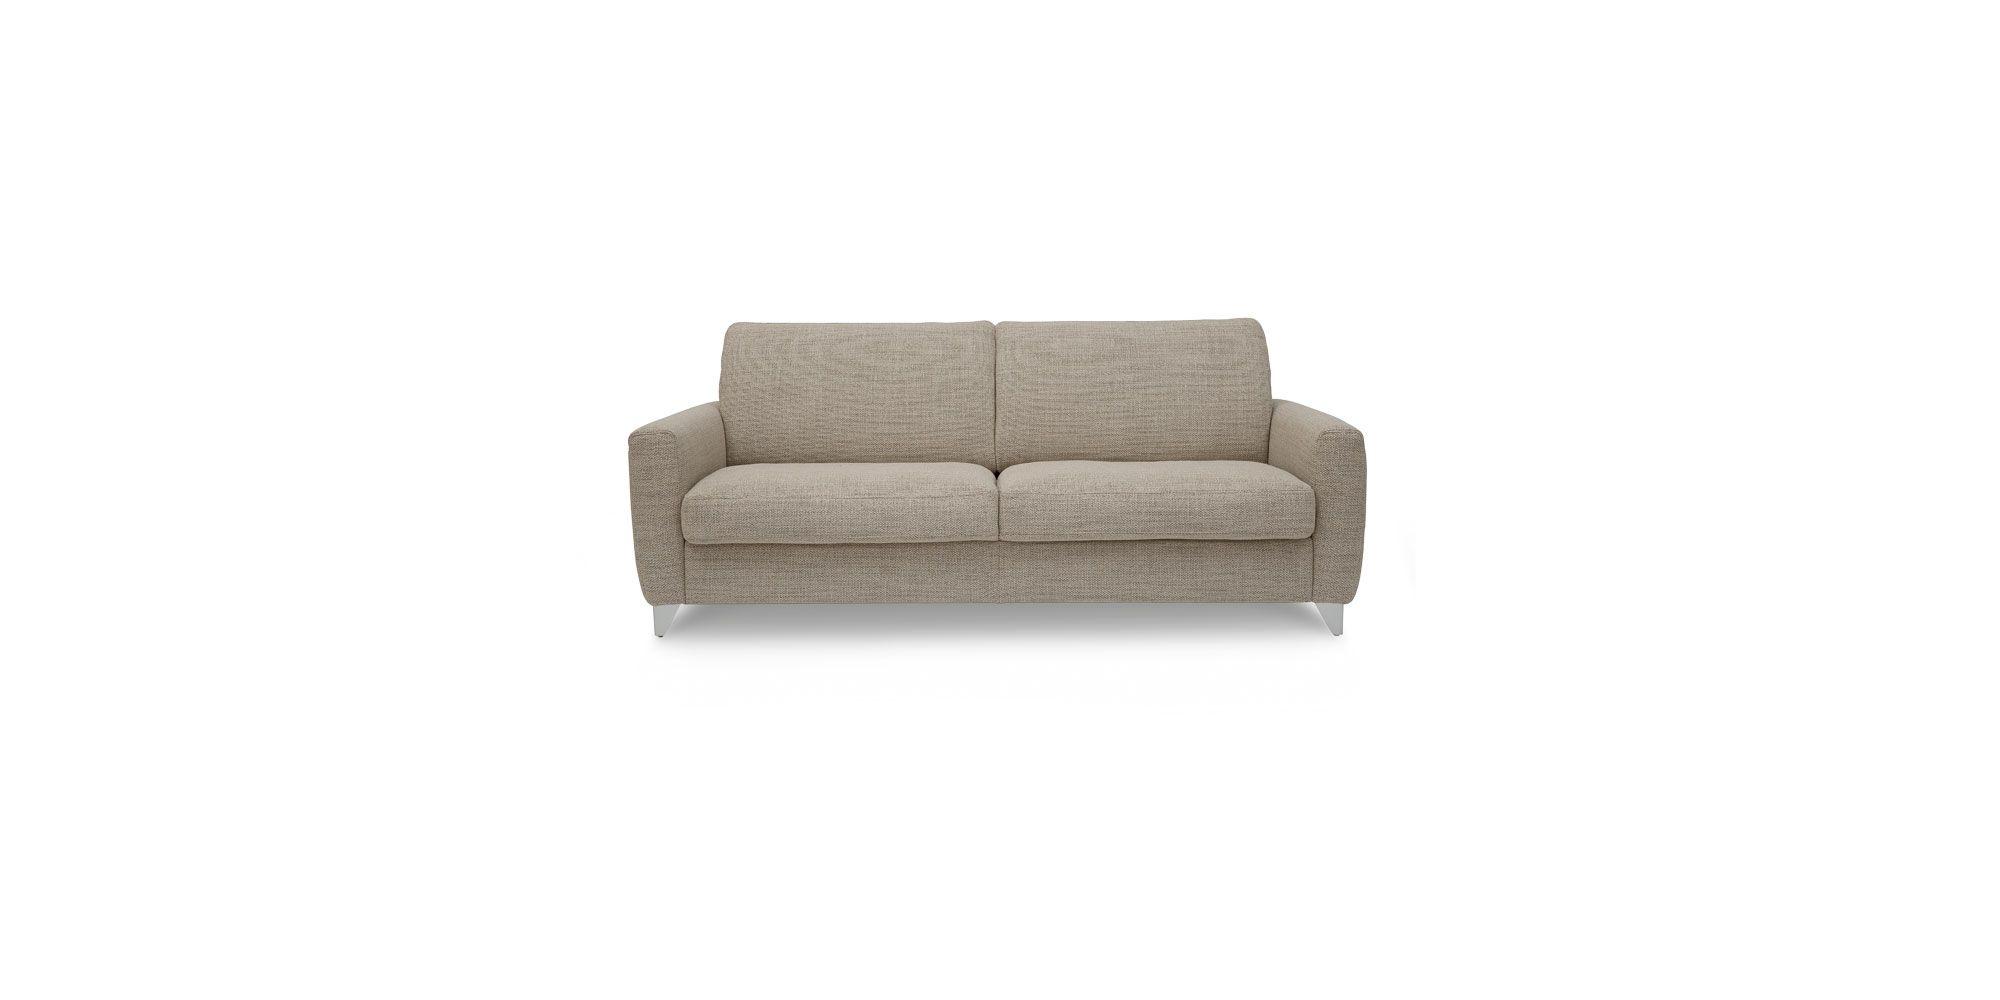 Sofa CombiPlus mit Relaxfunktion - Ewald Schillig brand | Salon ...